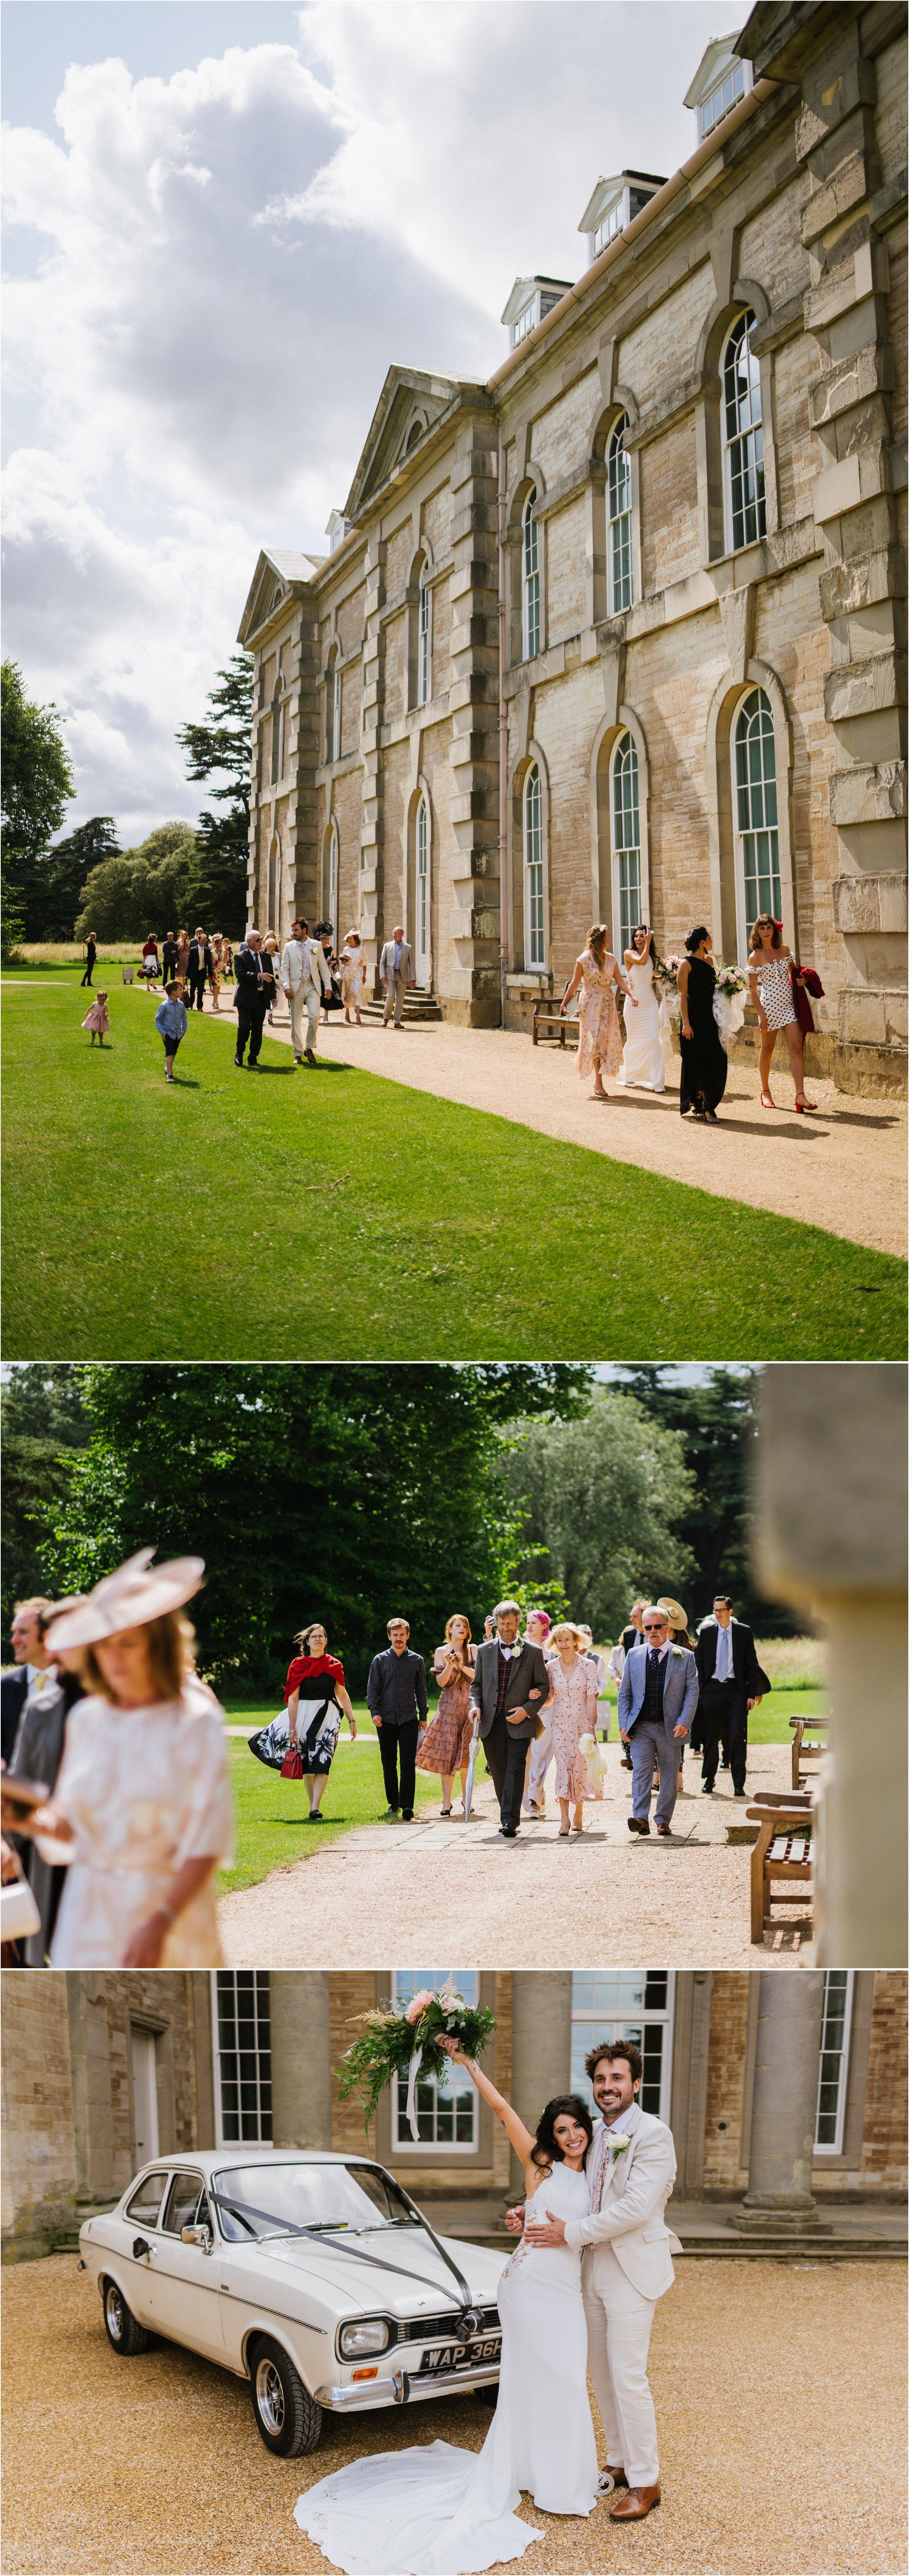 Compton Verney wedding photography_0084.jpg